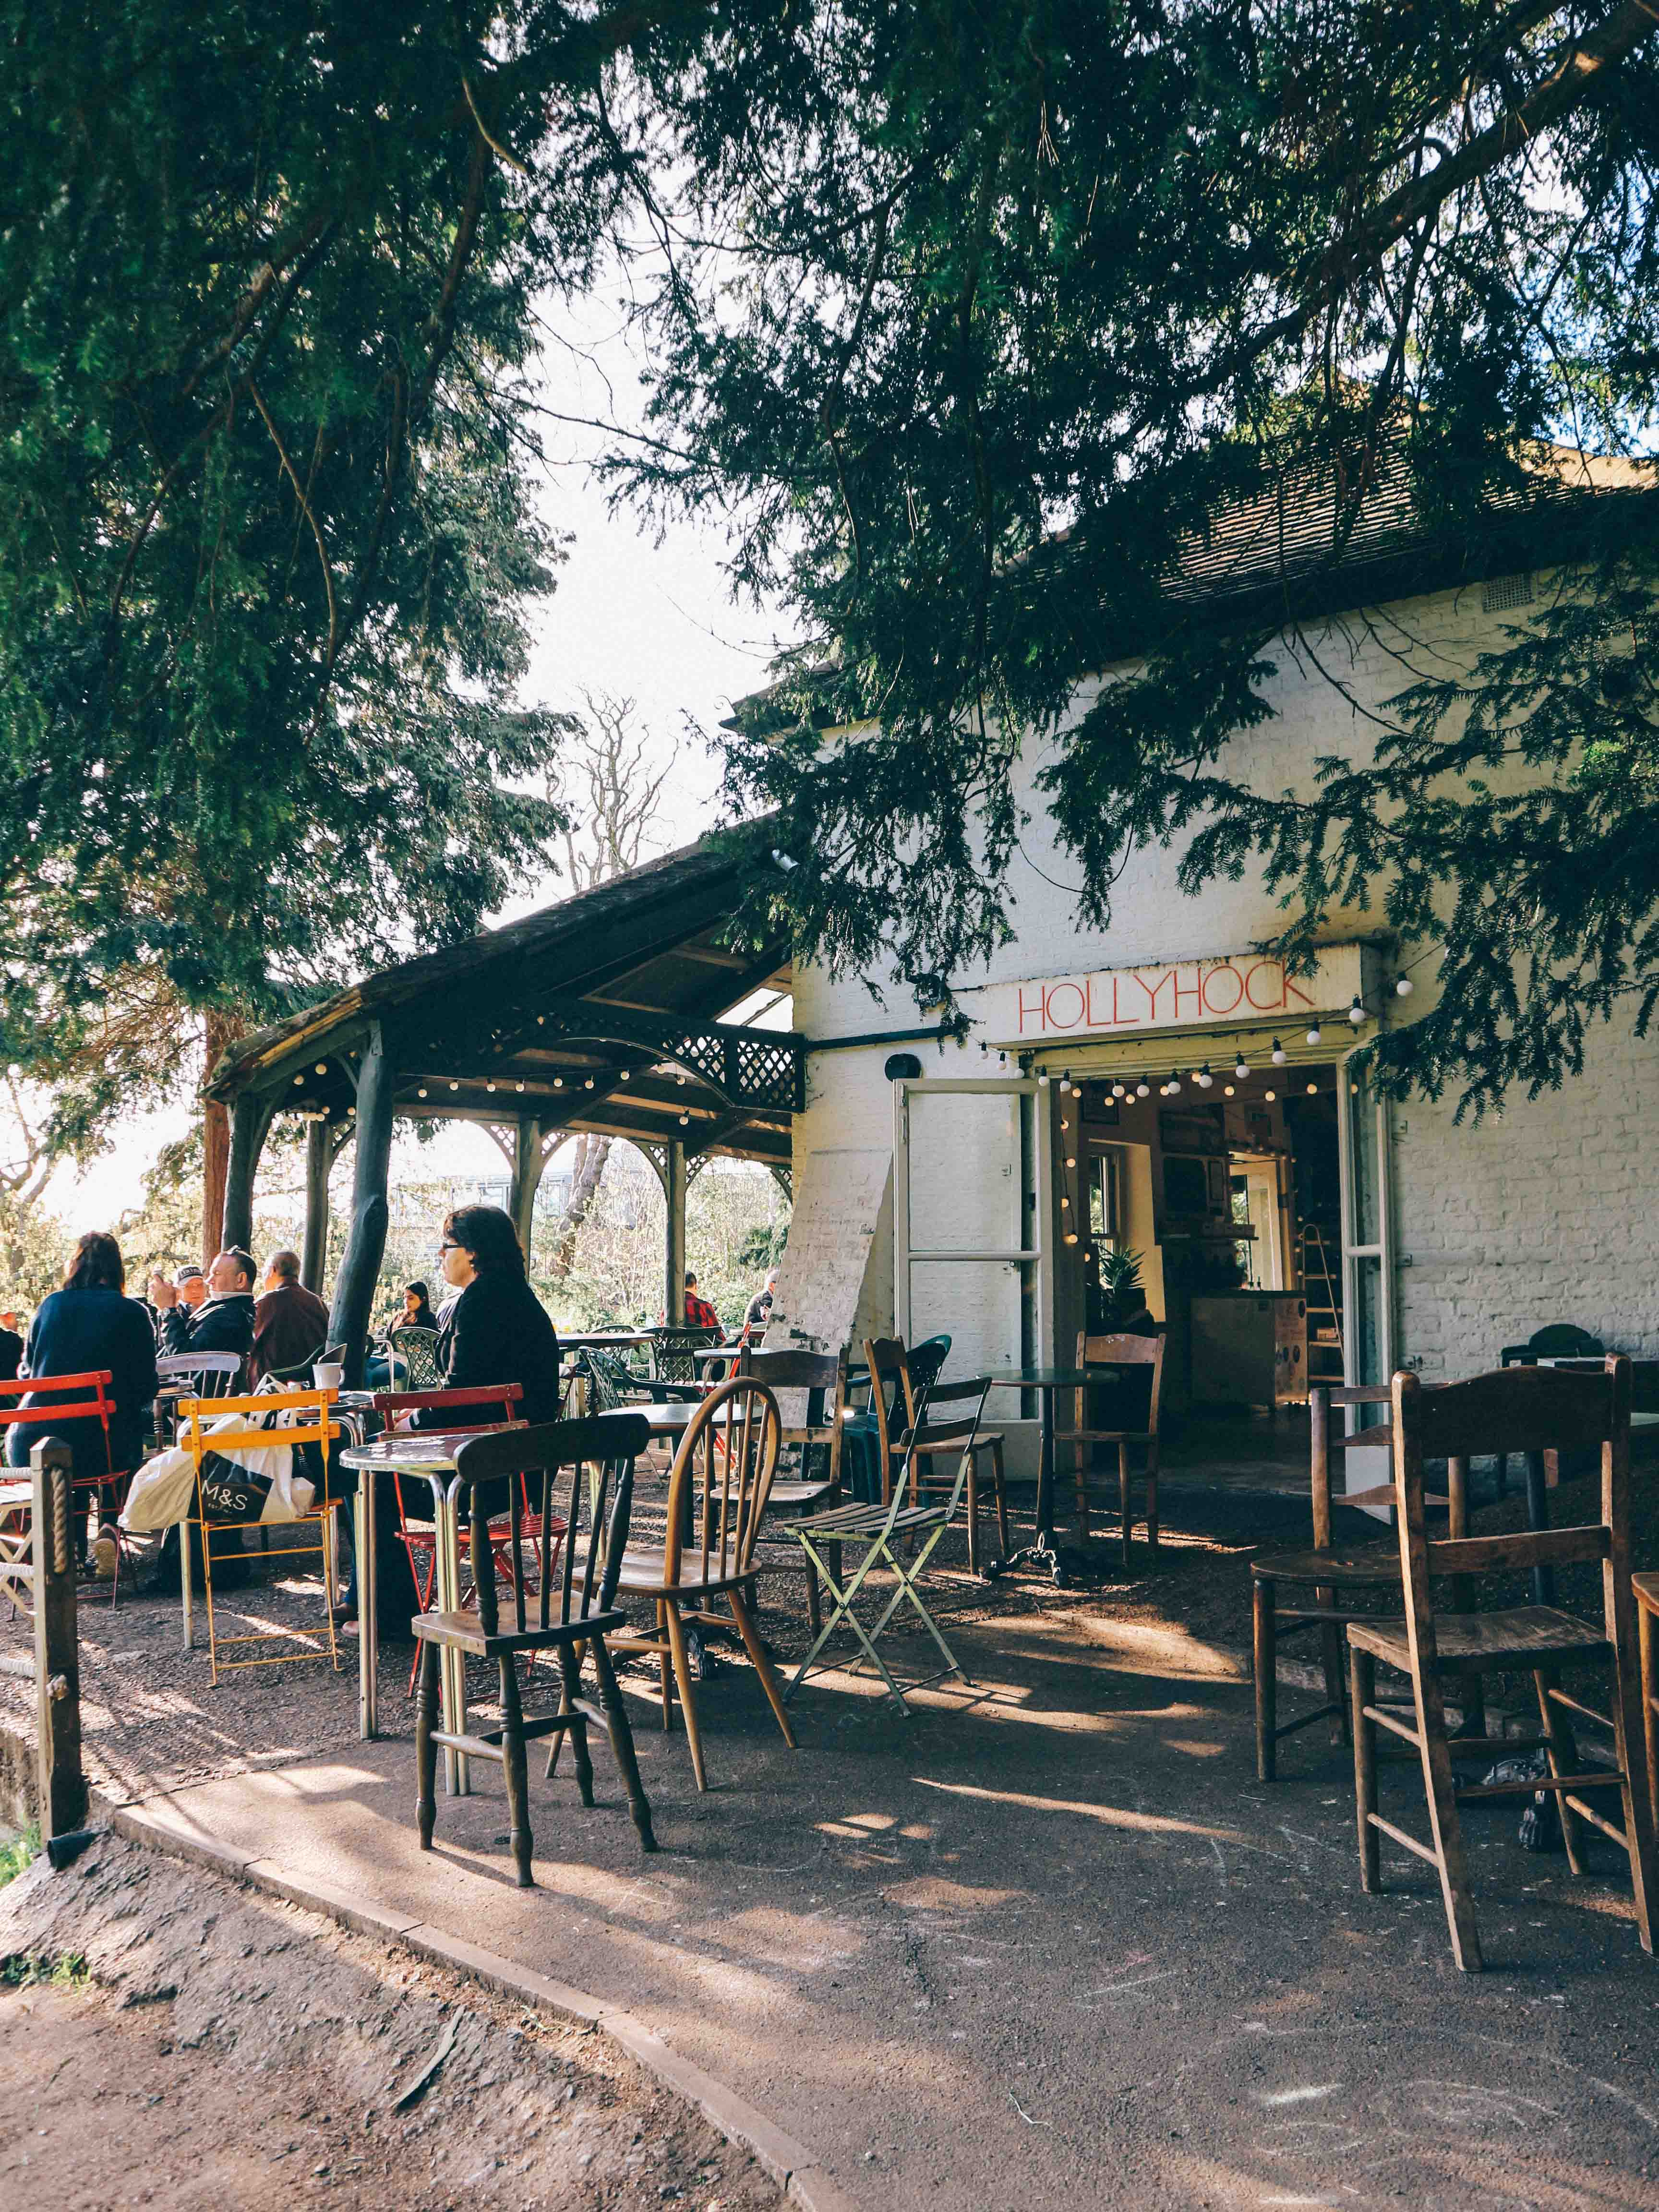 Nattastes Hollyhock Cafe Natinstablog